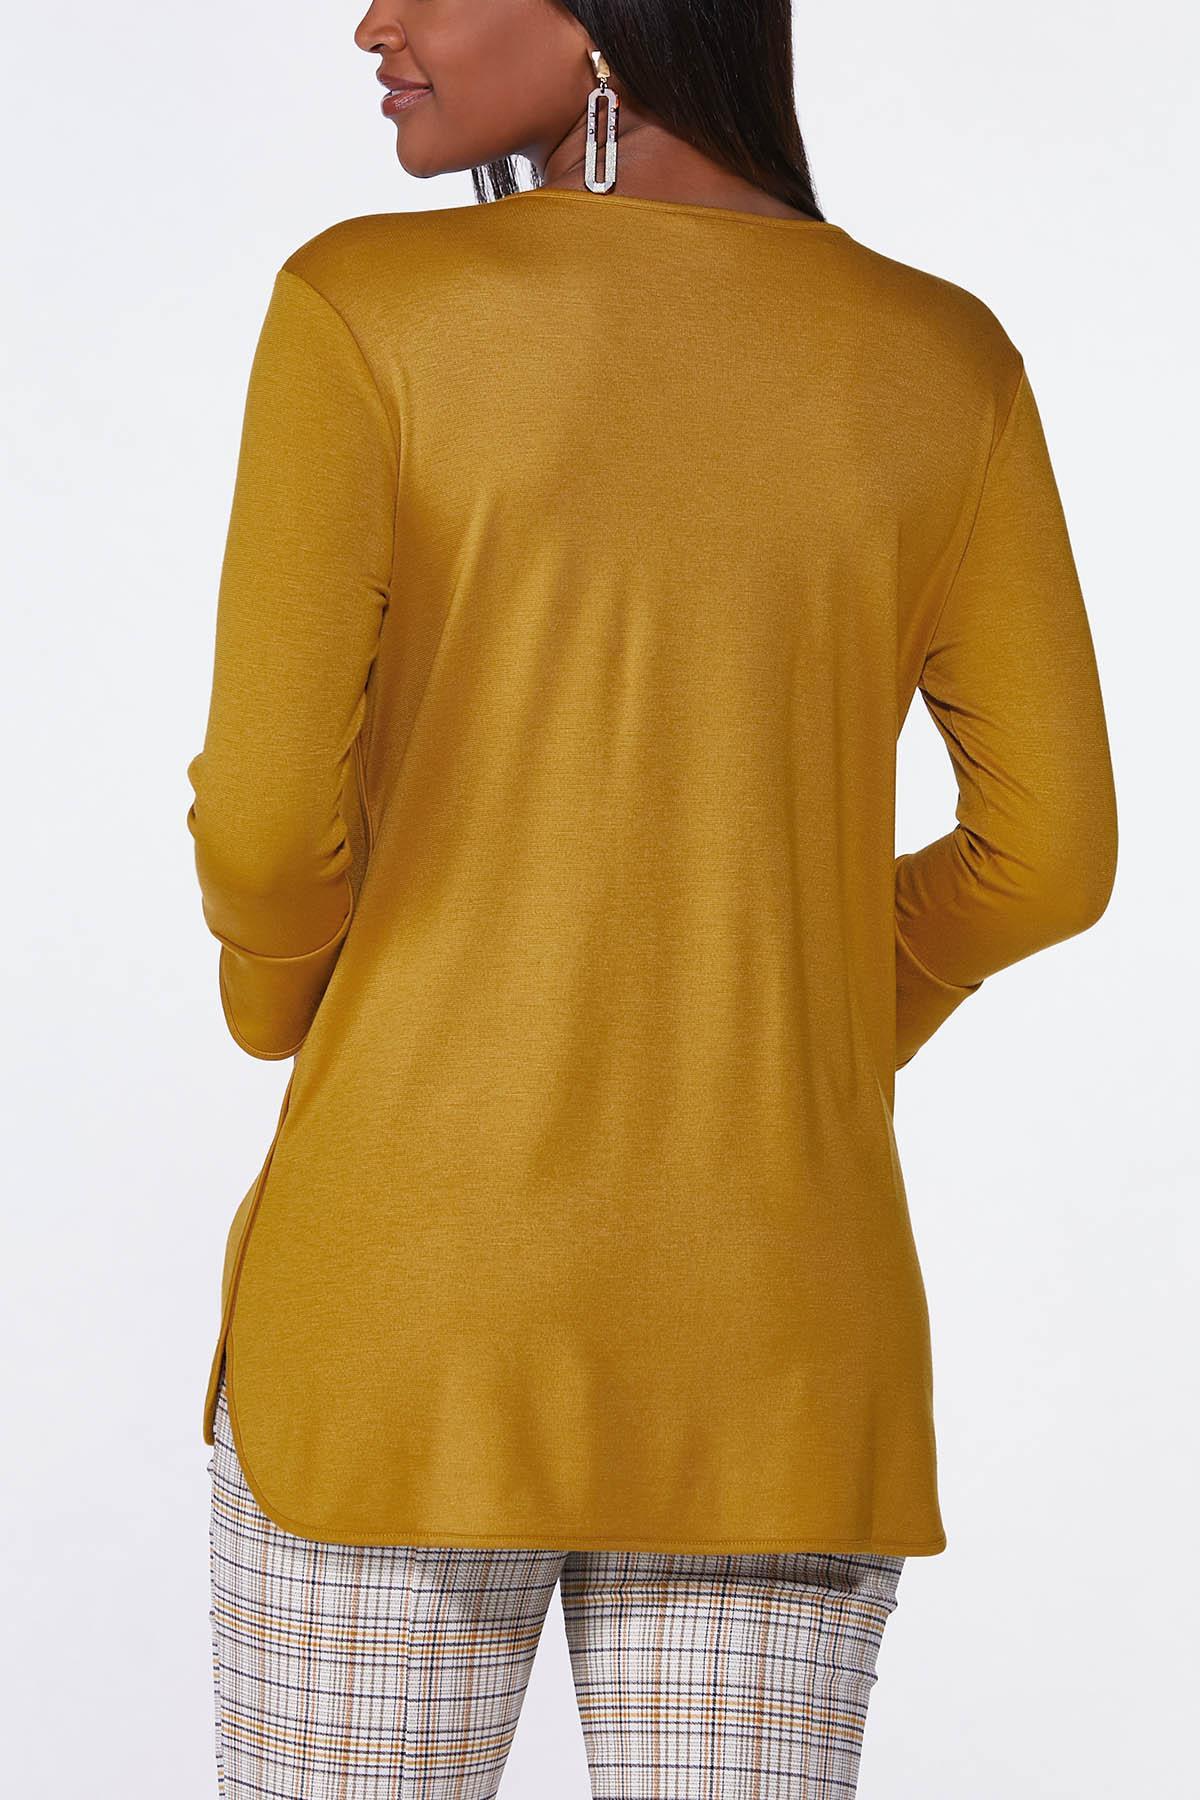 Plus Size Zip Neck Pullover Top (Item #44705806)